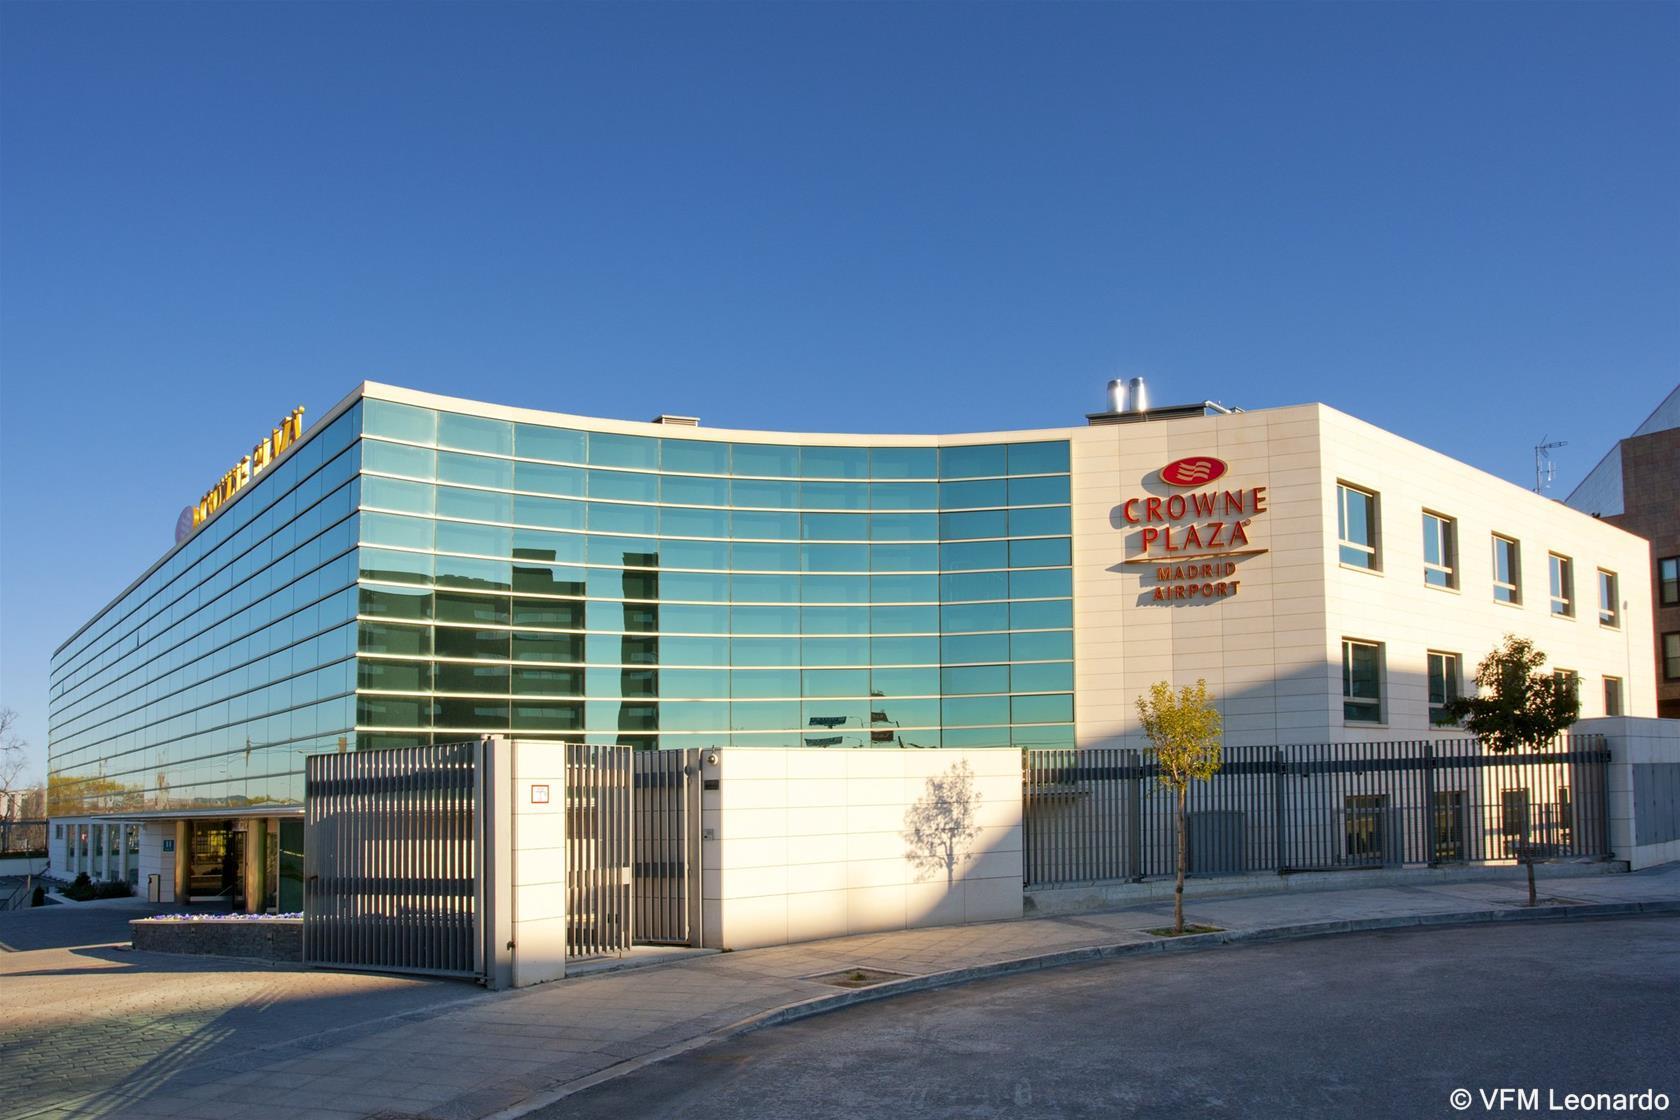 Hotel Crowne Plaza Madrid Airport